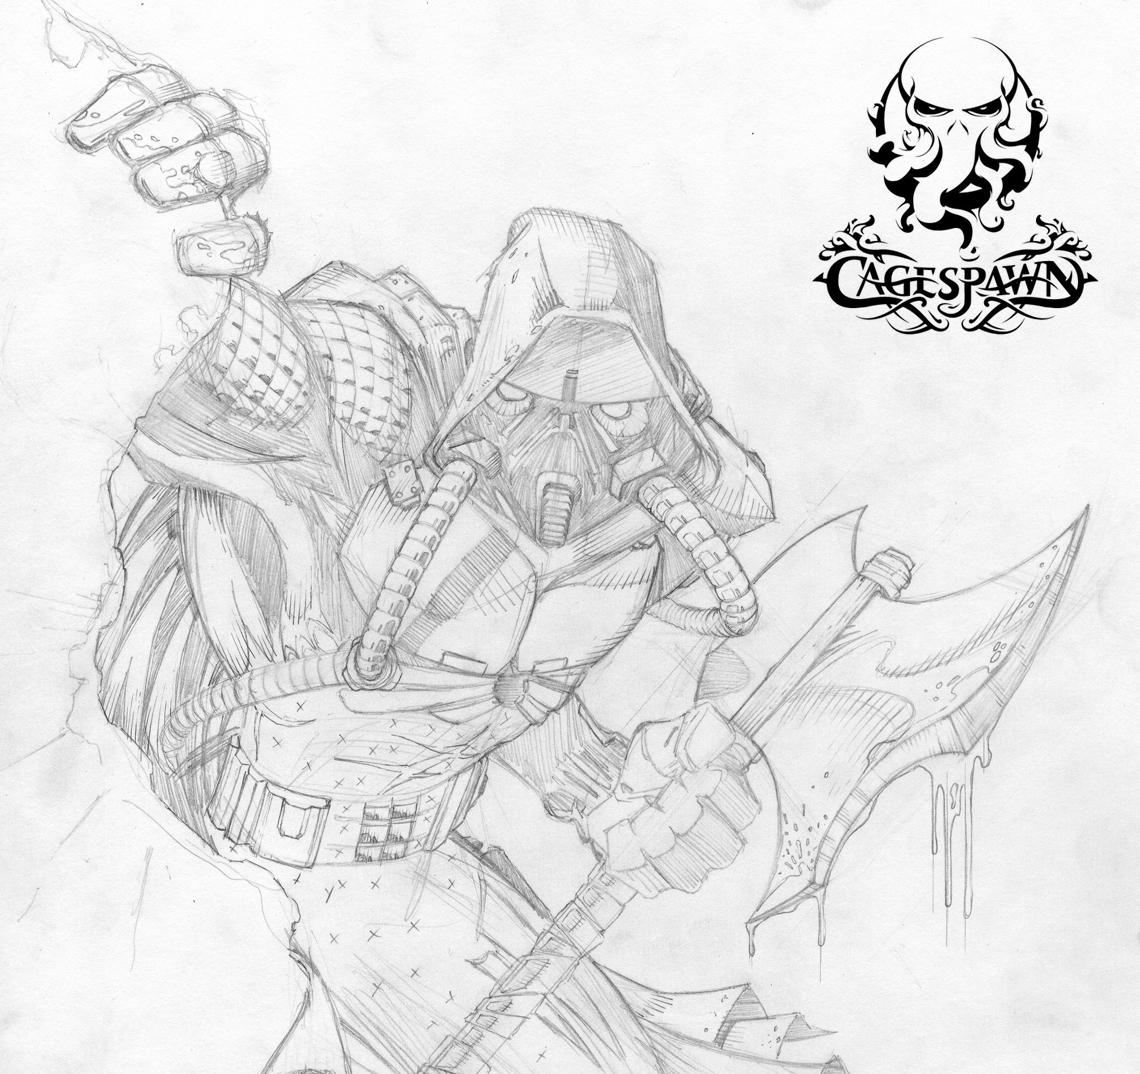 CageSpawn Logo Design and Sketch